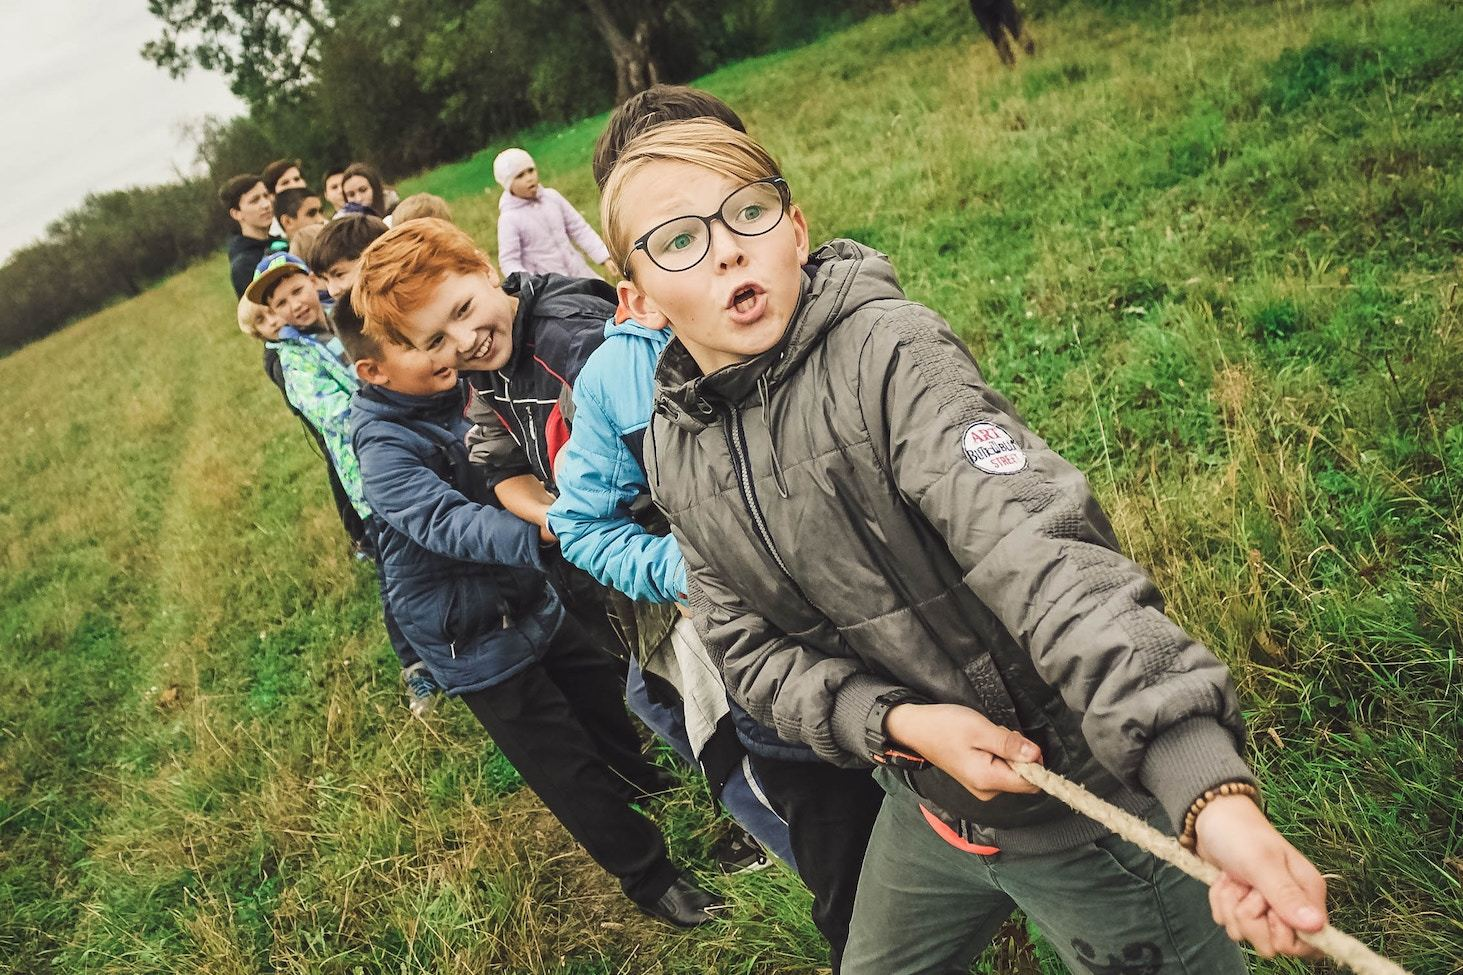 children play tug-of-war in a grassy field